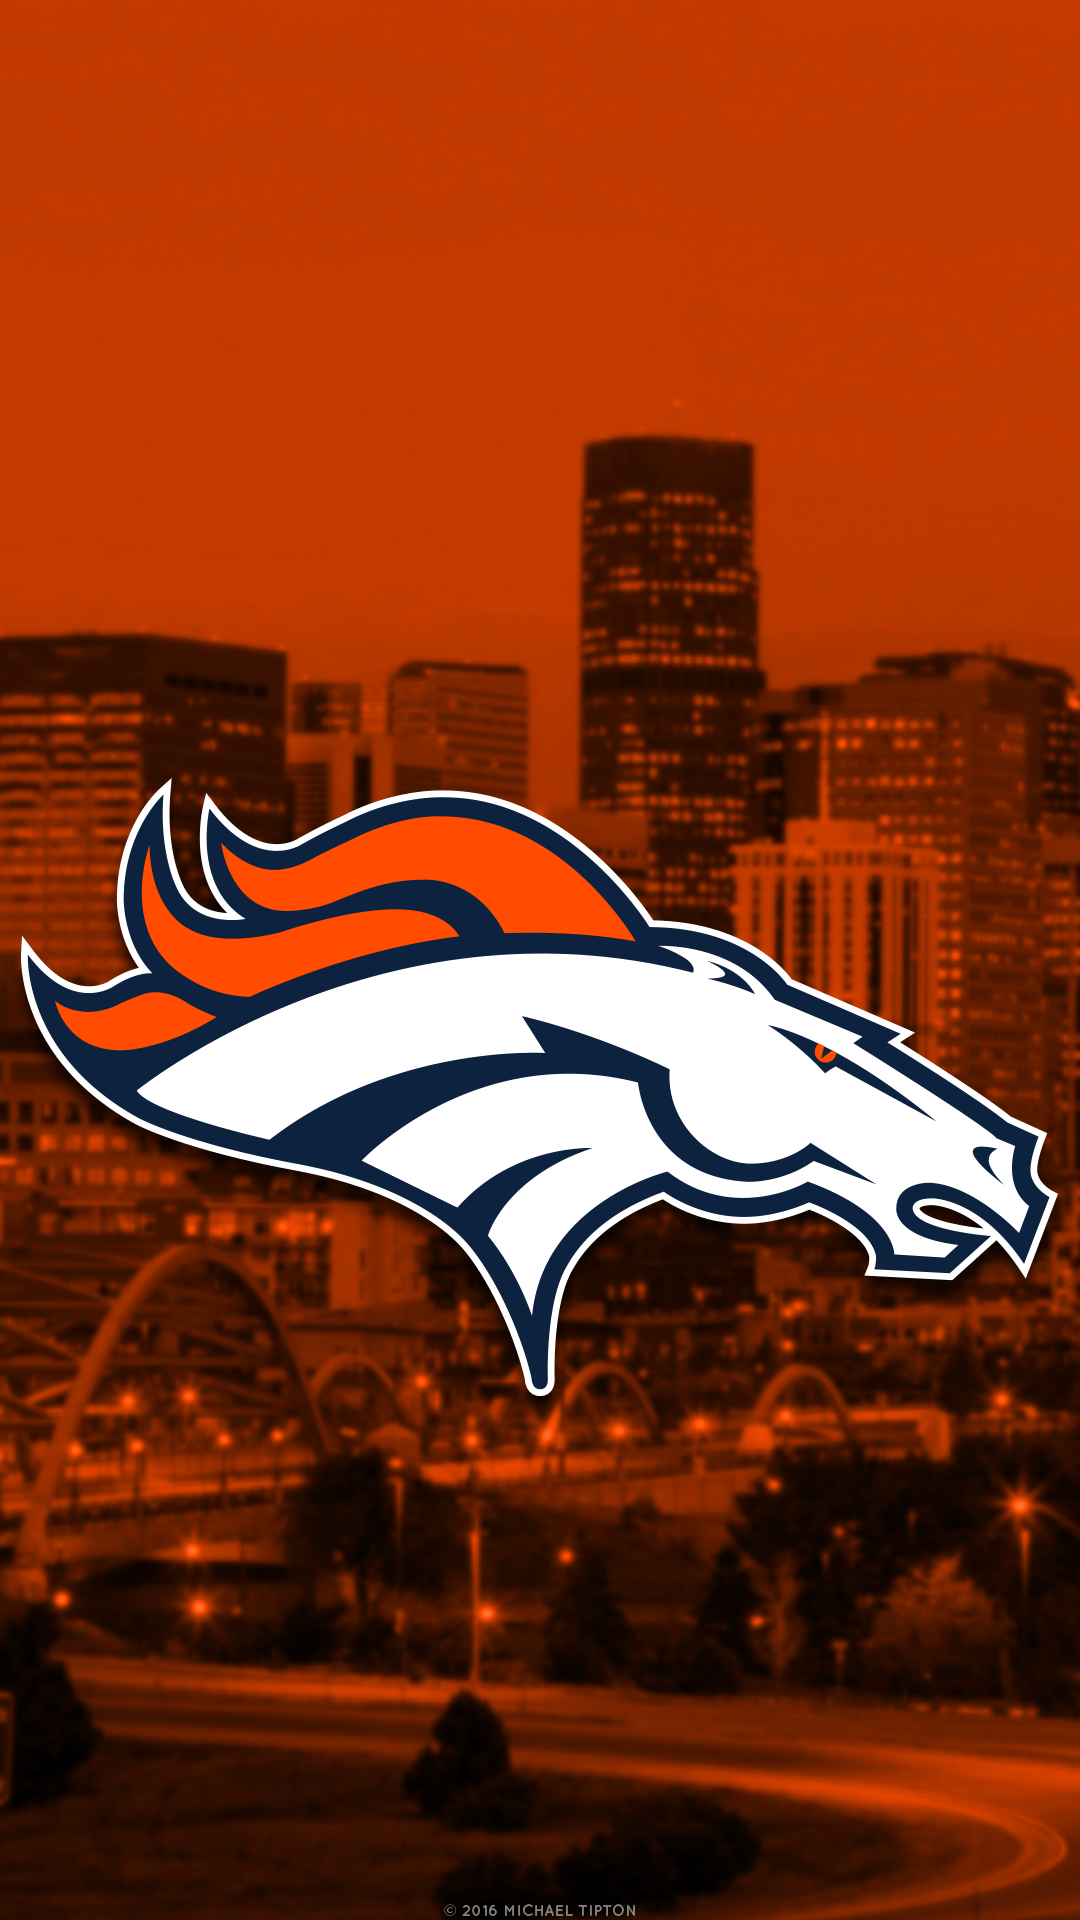 Denver Broncos 2018 Wallpapers - Wallpaper CaveDenver Broncos Iphone X Wallpaper